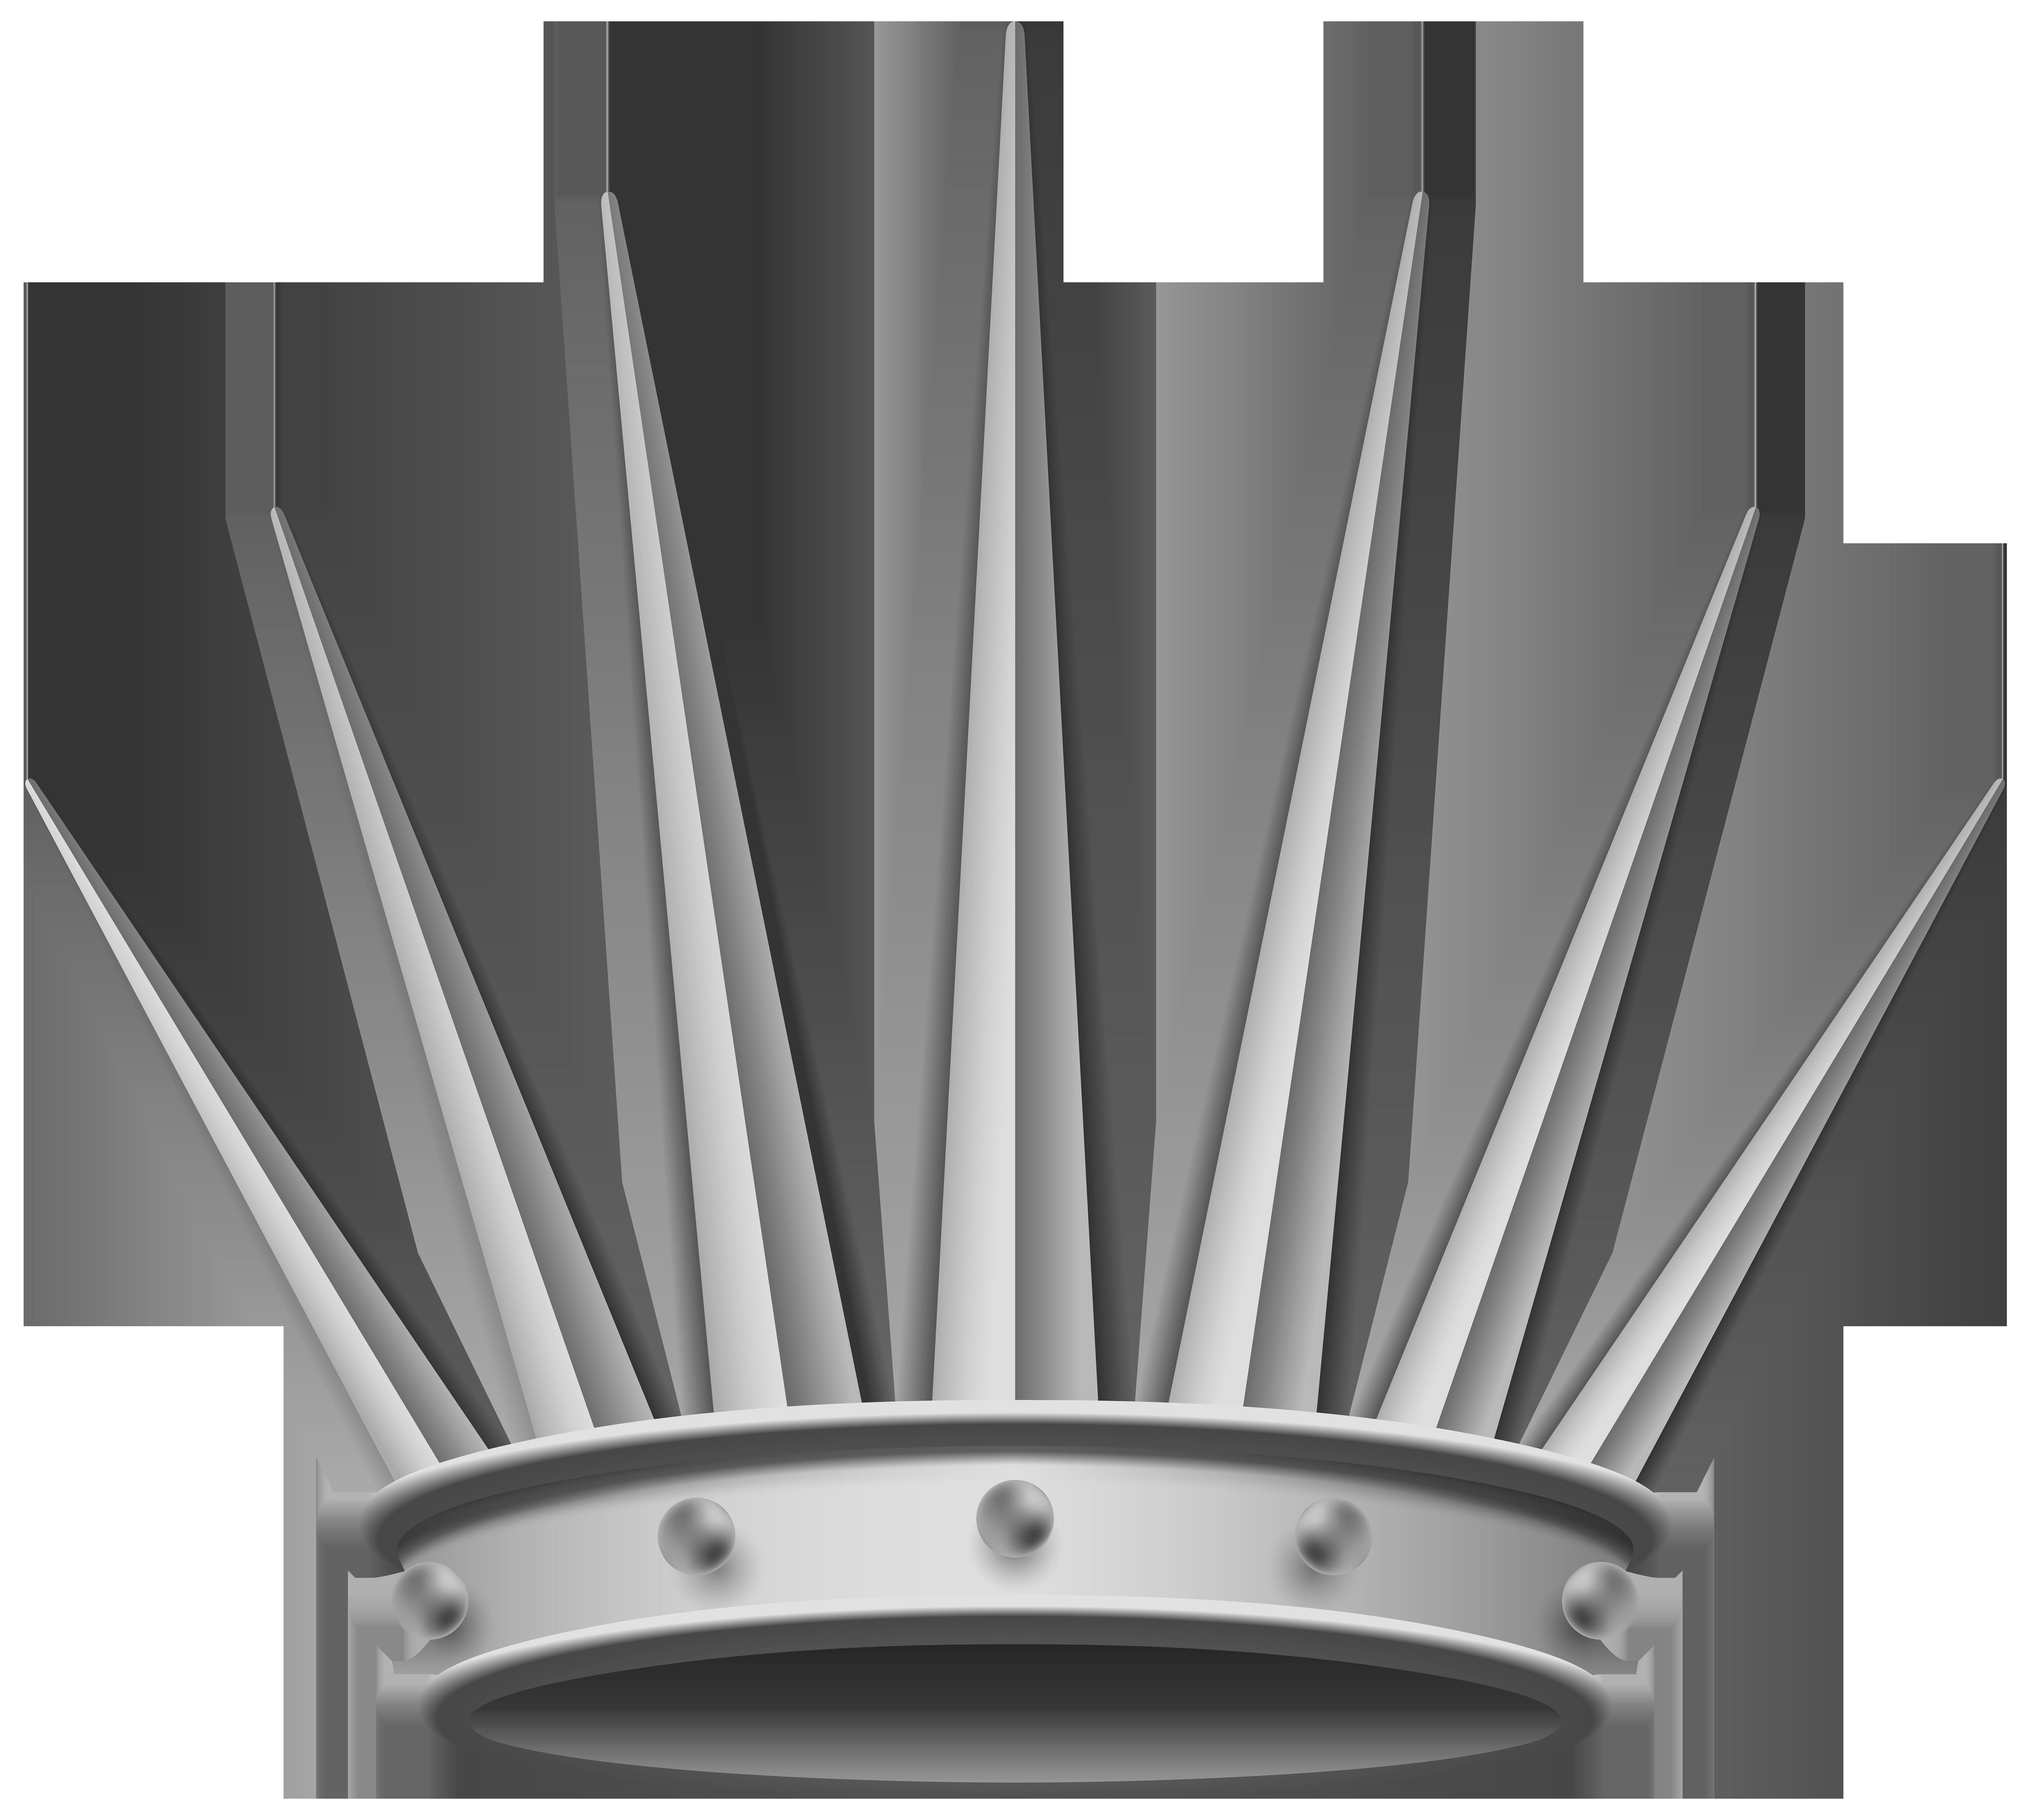 8000x7169 Silver Crown Transparent Png Clip Art Imageu200b Gallery